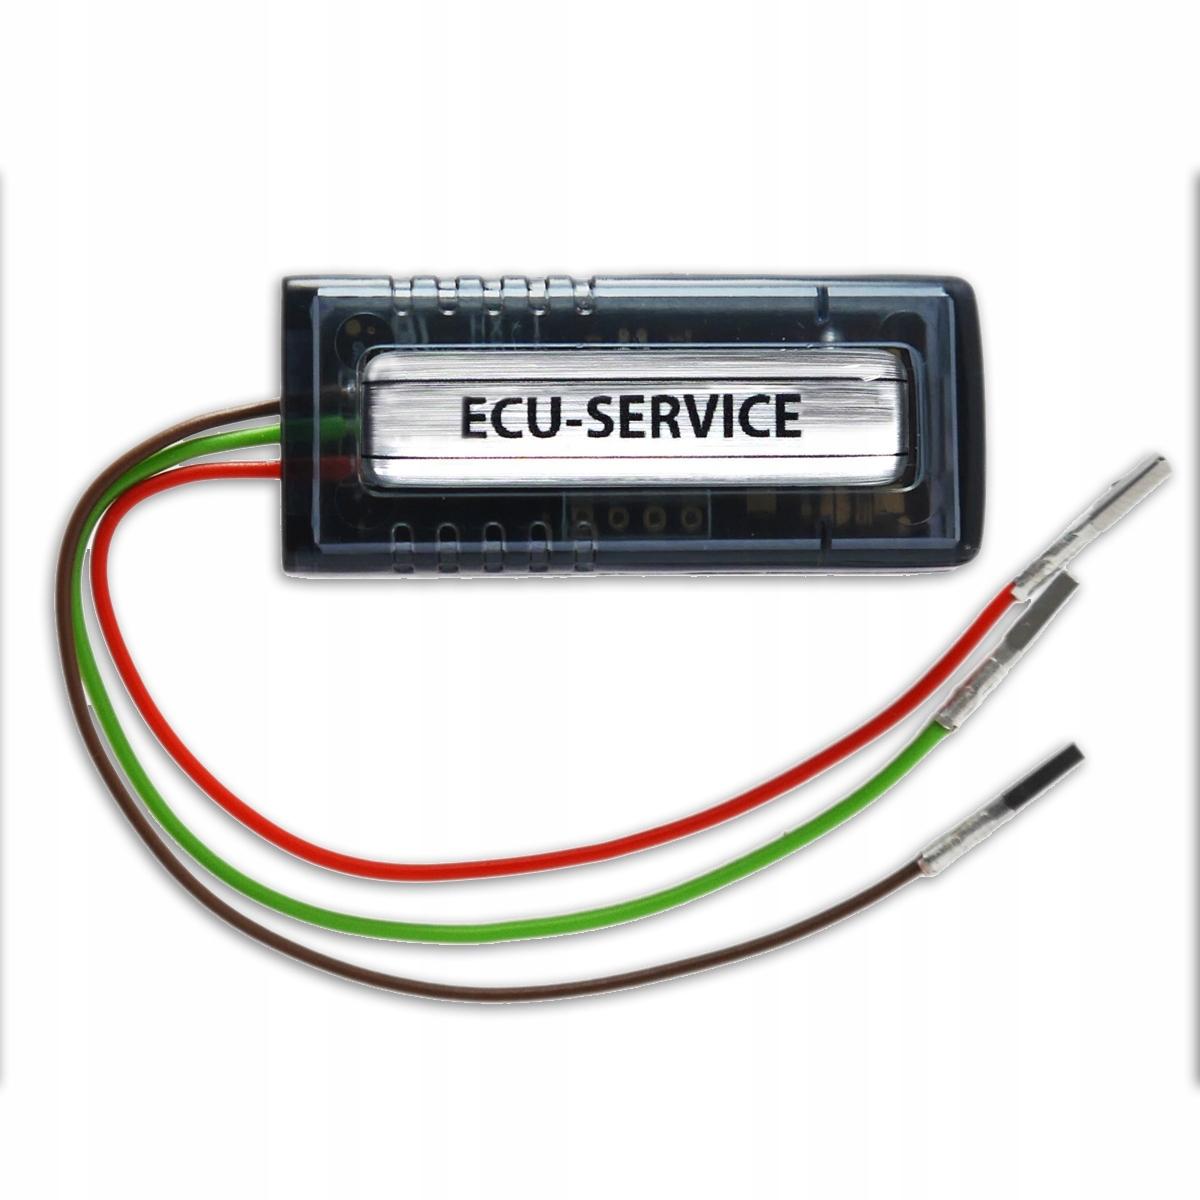 эмулятор коврики bmw e60 e63 e64 e65 e81 e82 e85 контакты